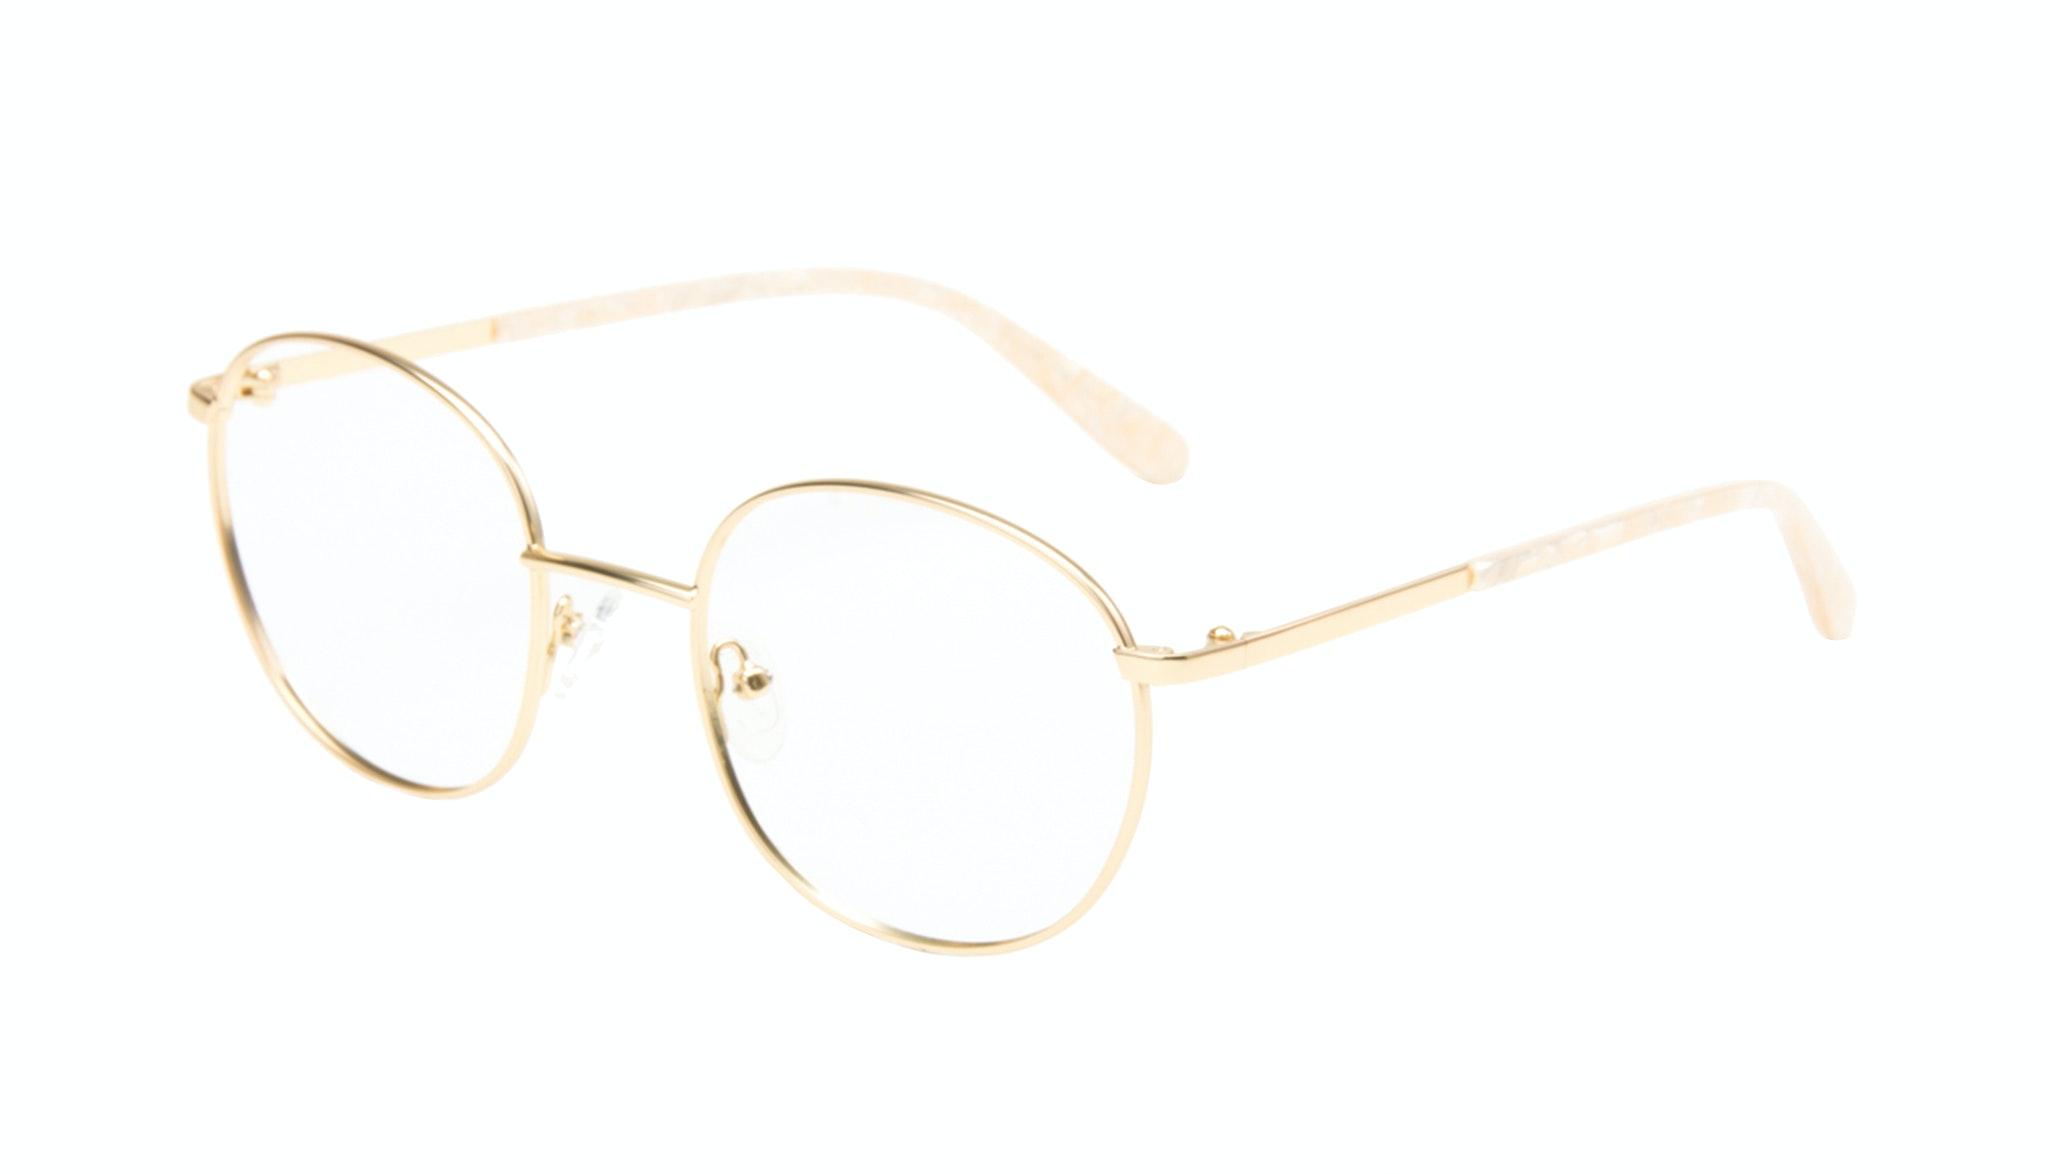 Affordable Fashion Glasses Round Eyeglasses Women Joy Gold Marble Tilt